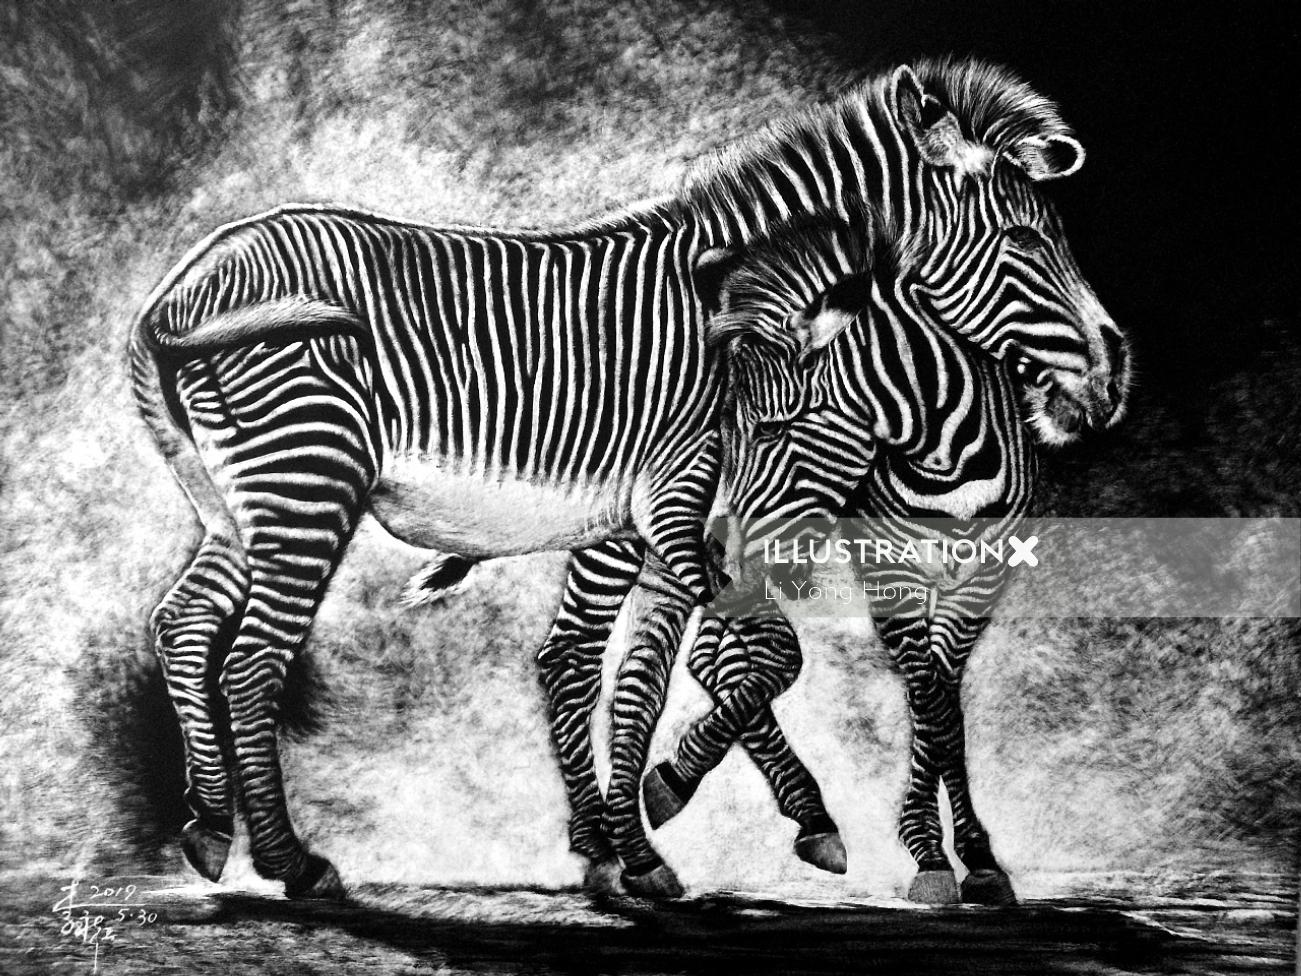 Animal illustration of Zebra